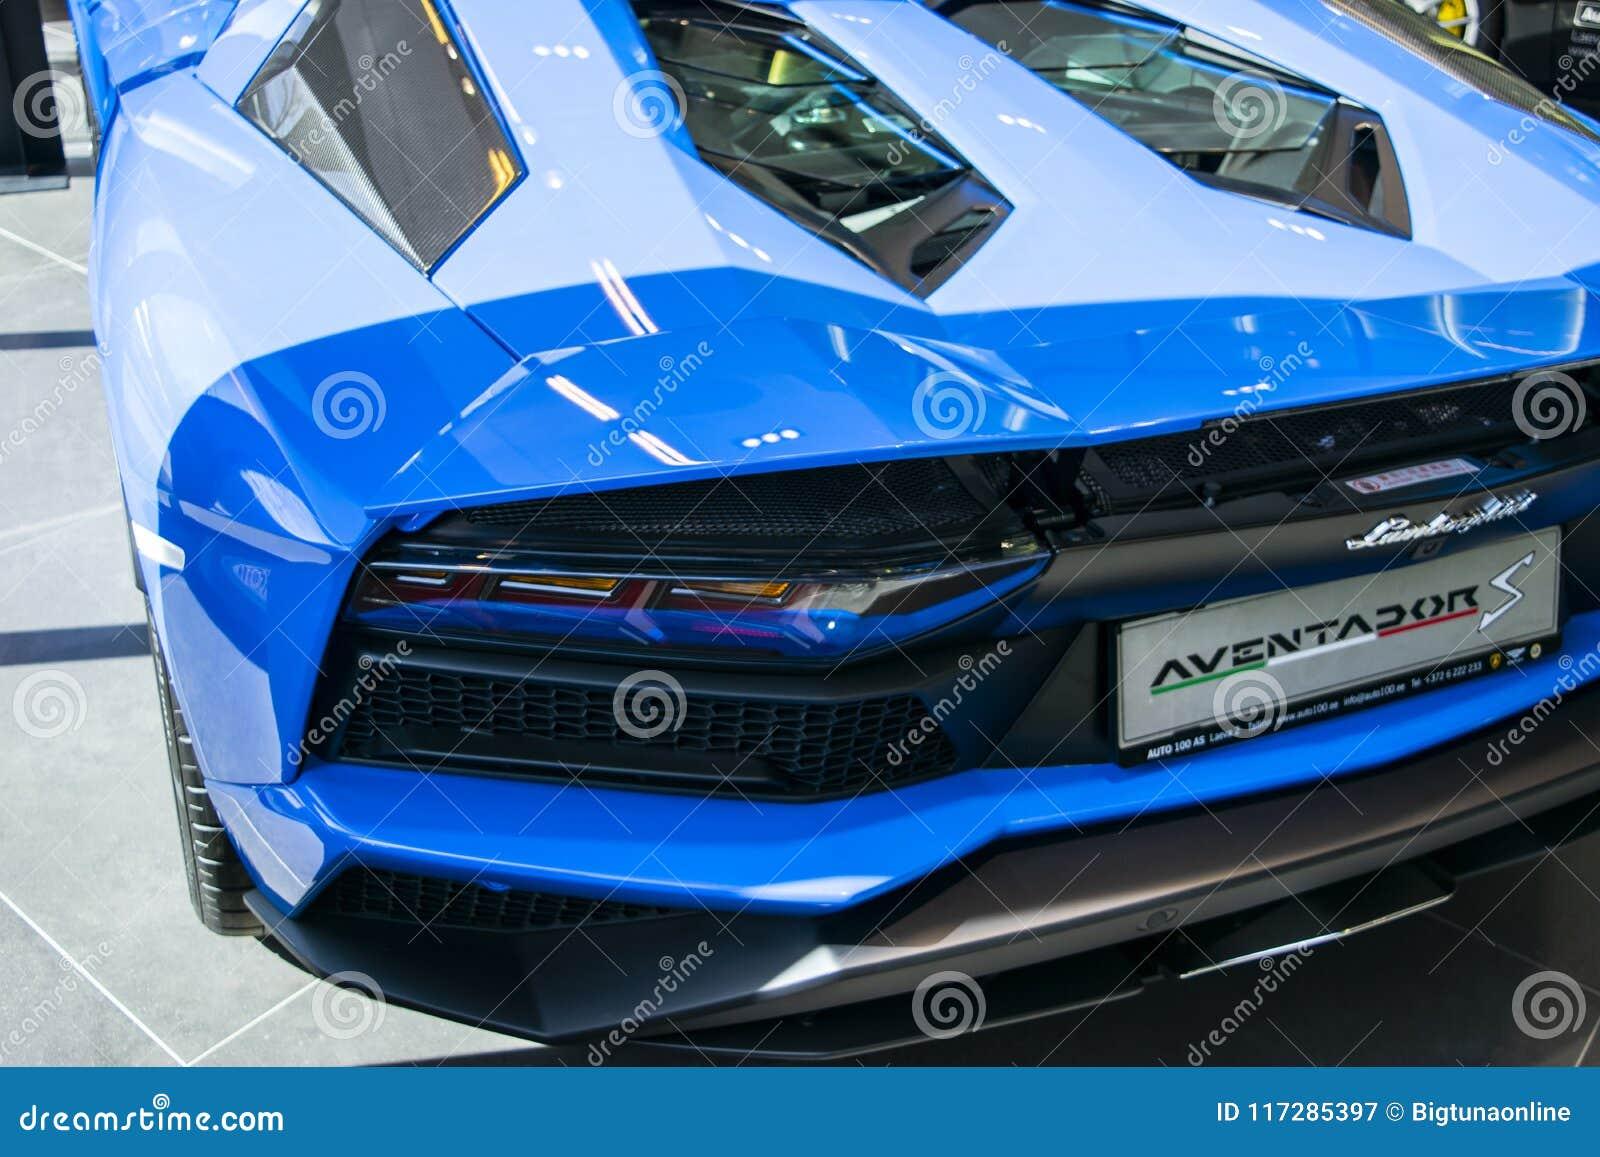 Back View Of A New Lamborghini Aventador S Coupe Headlight Car